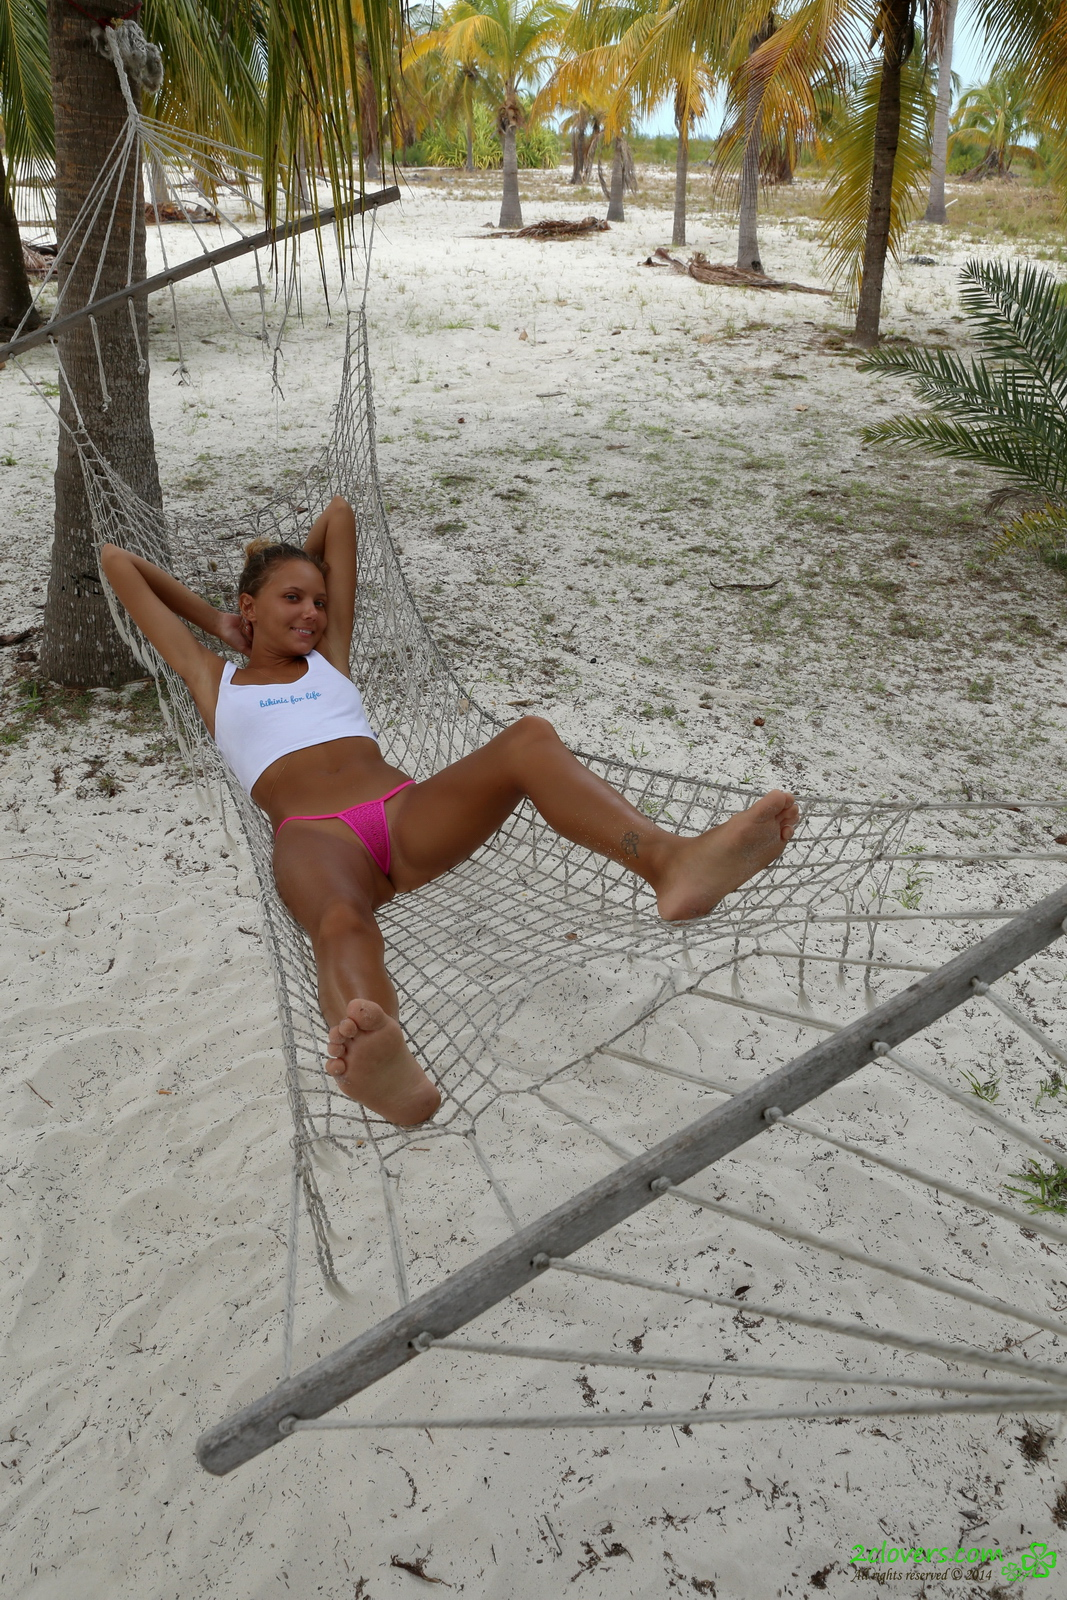 katya-clover-naked-on-sirena-beach-seaside-2clovers-14